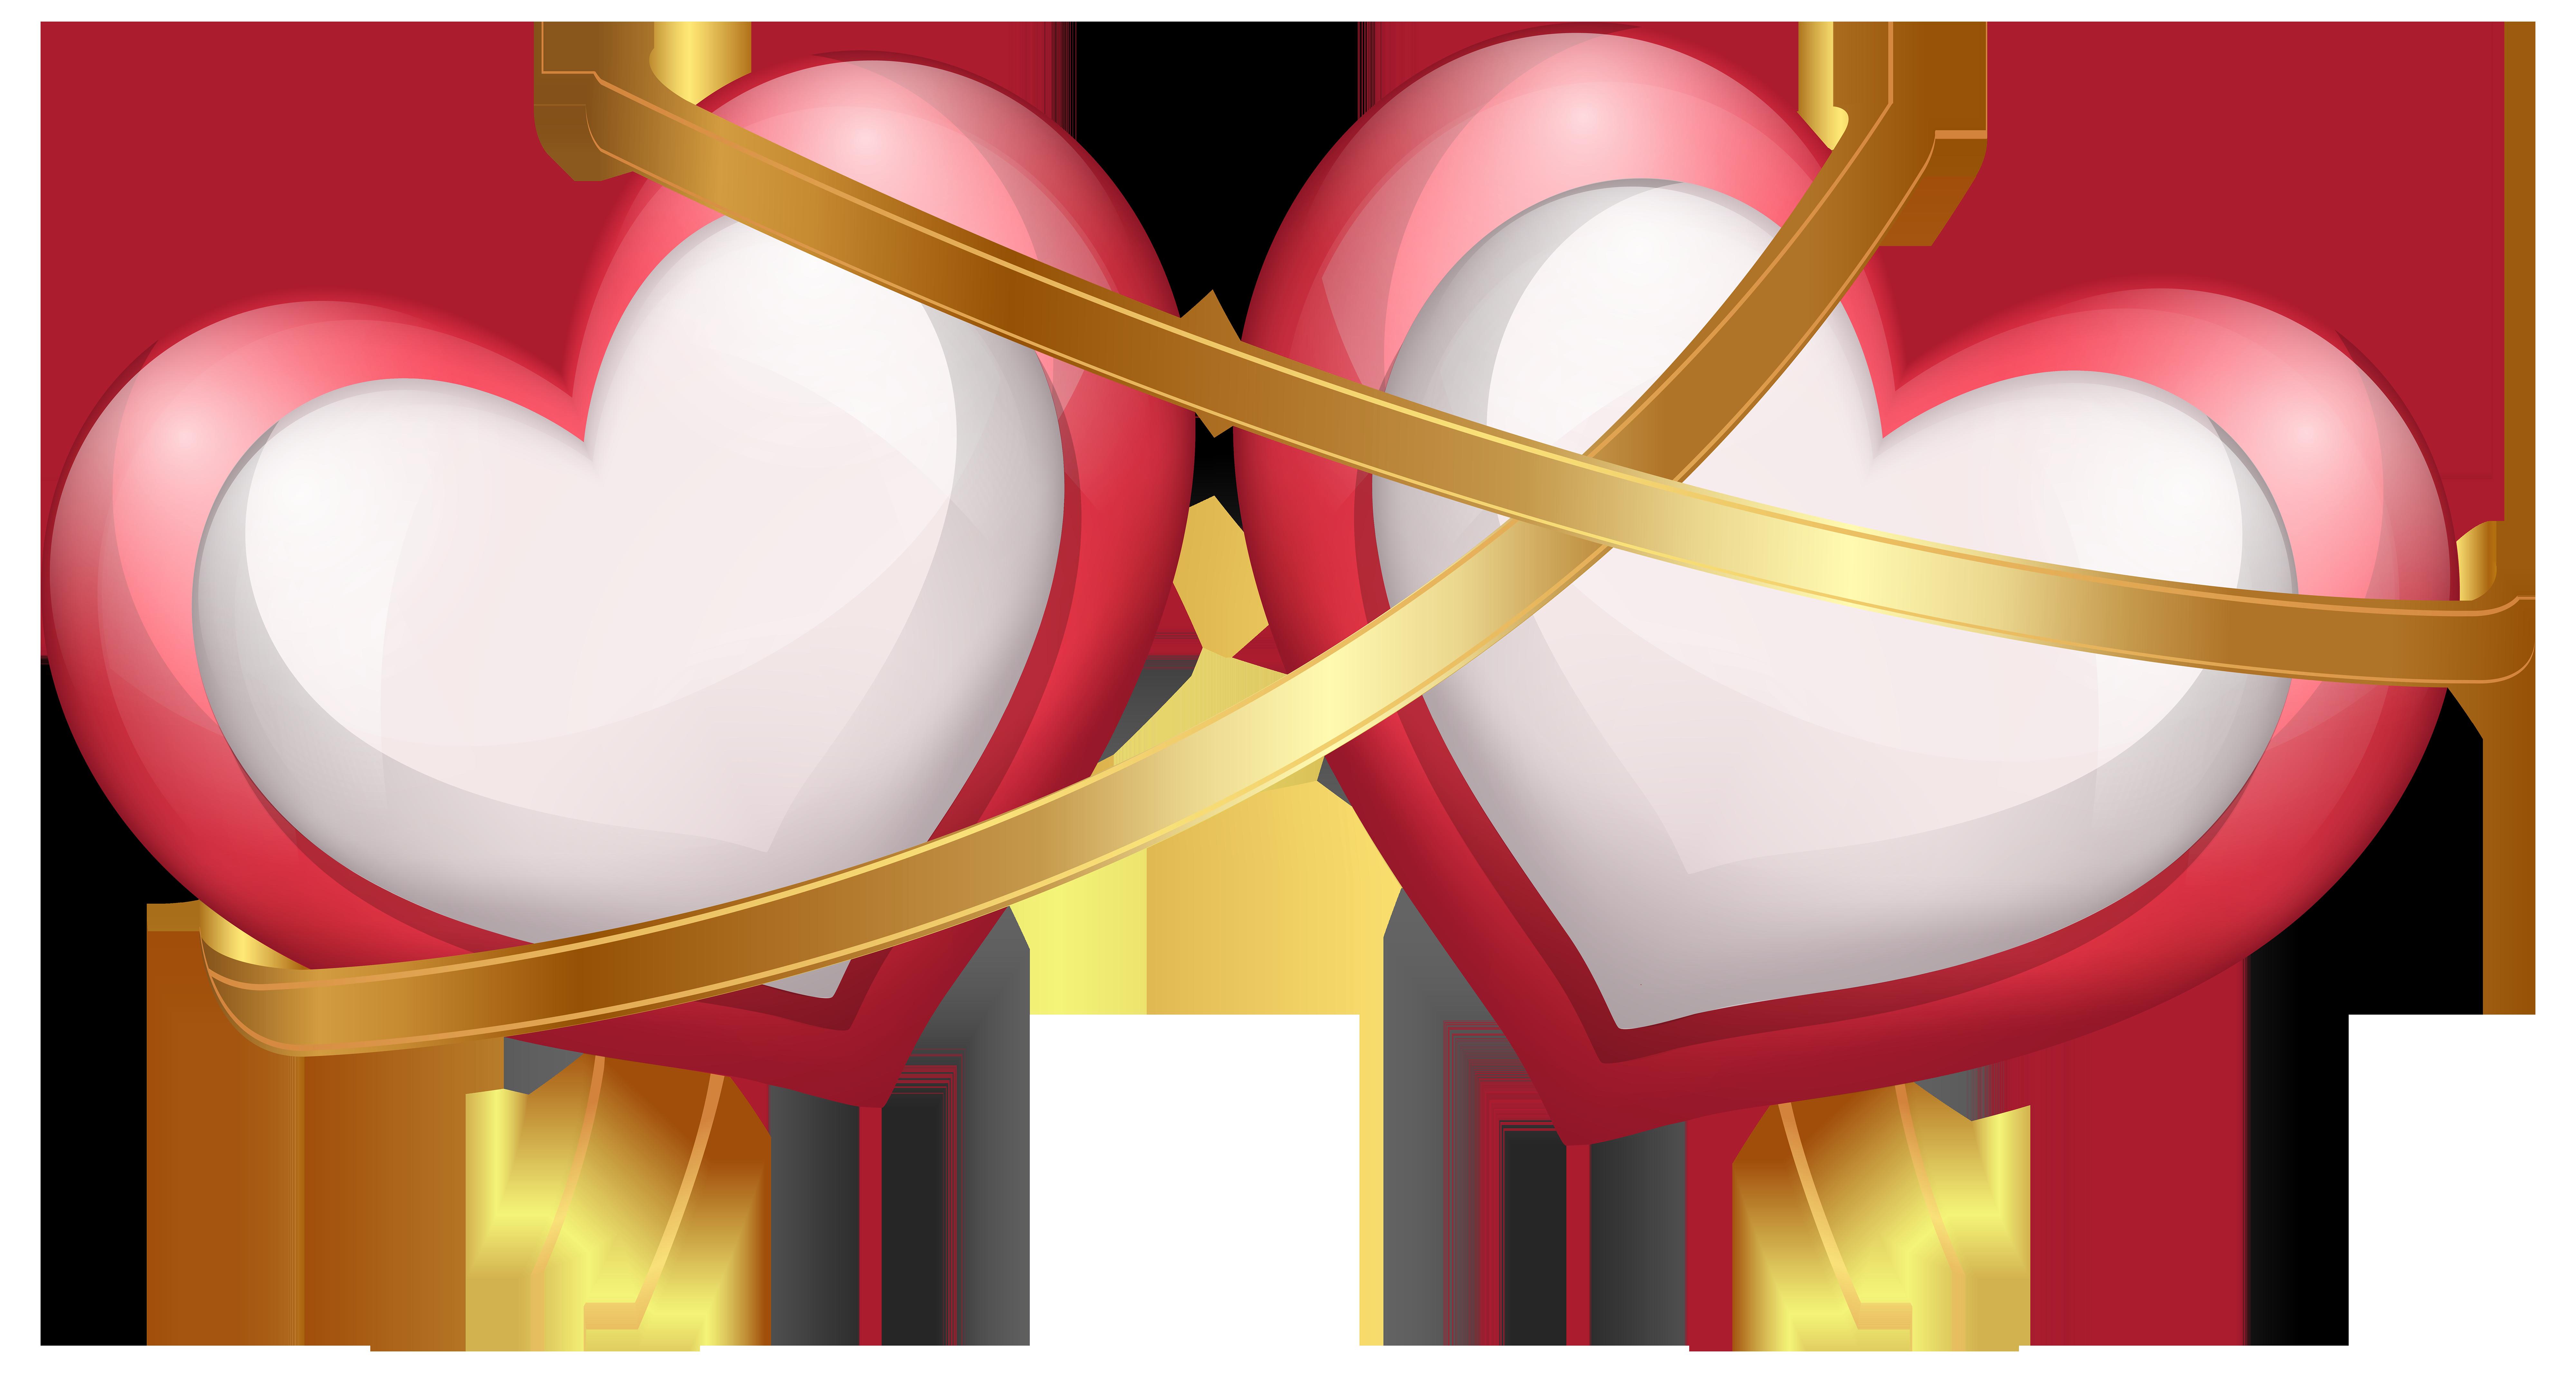 Two Hearts With Ribbon Transparent Png Clip Art Image Png Minnie Png Fotos De Criancas